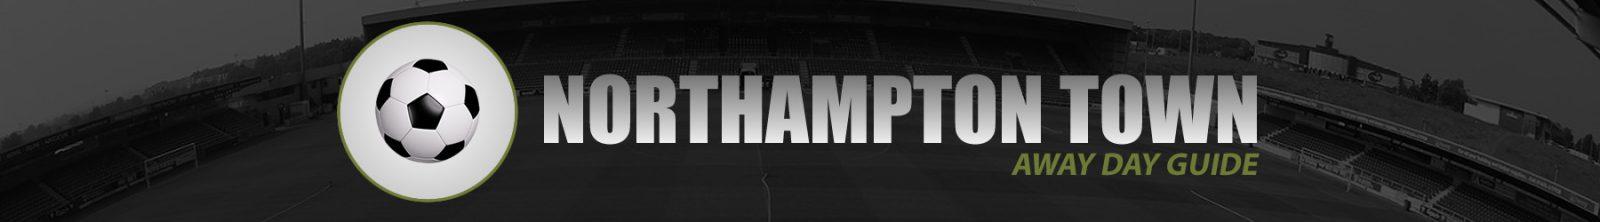 Northampton Town Away